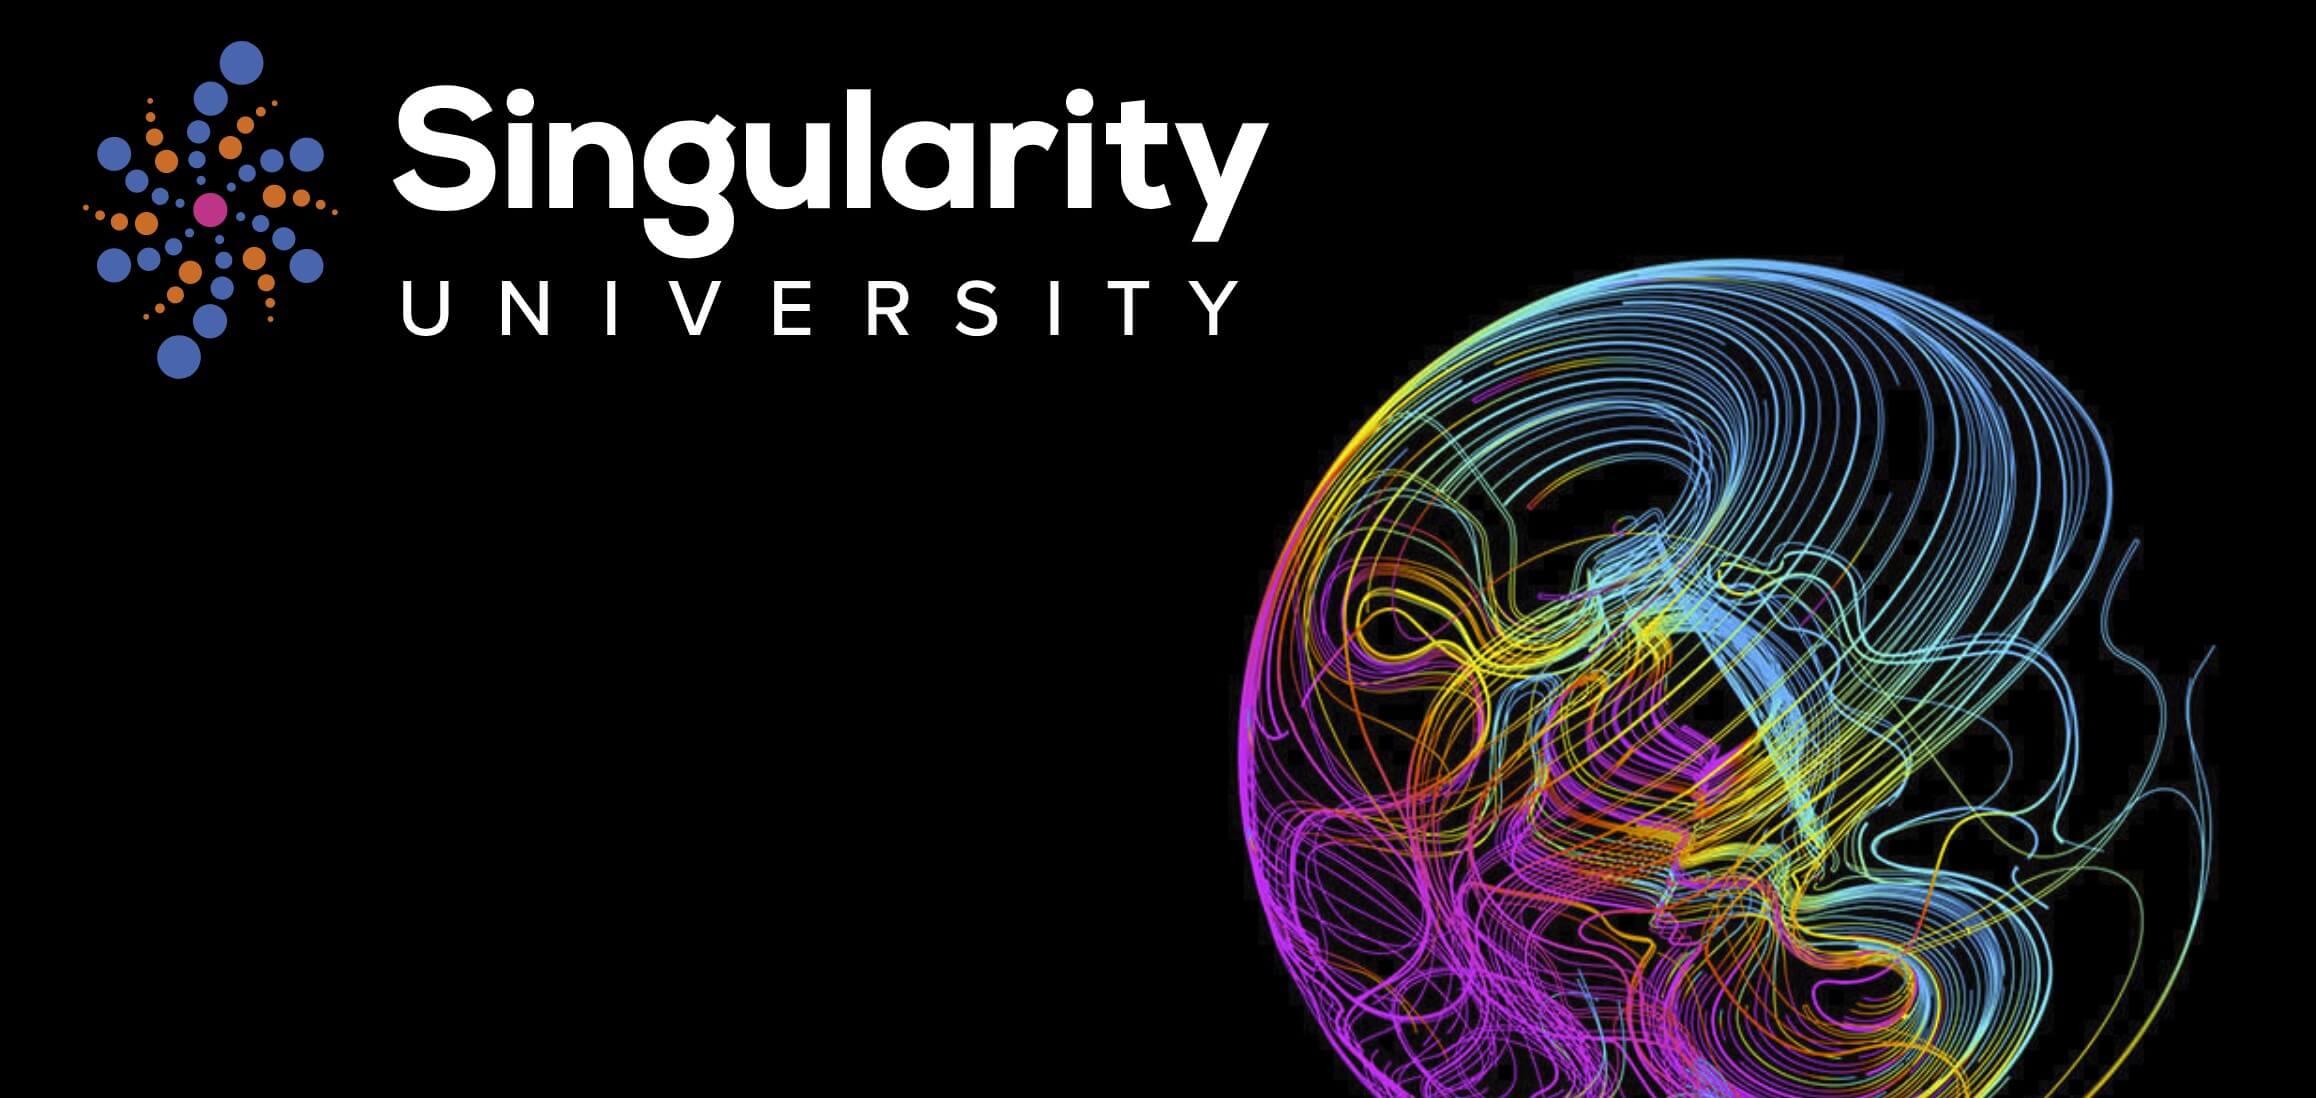 Singularity 2019